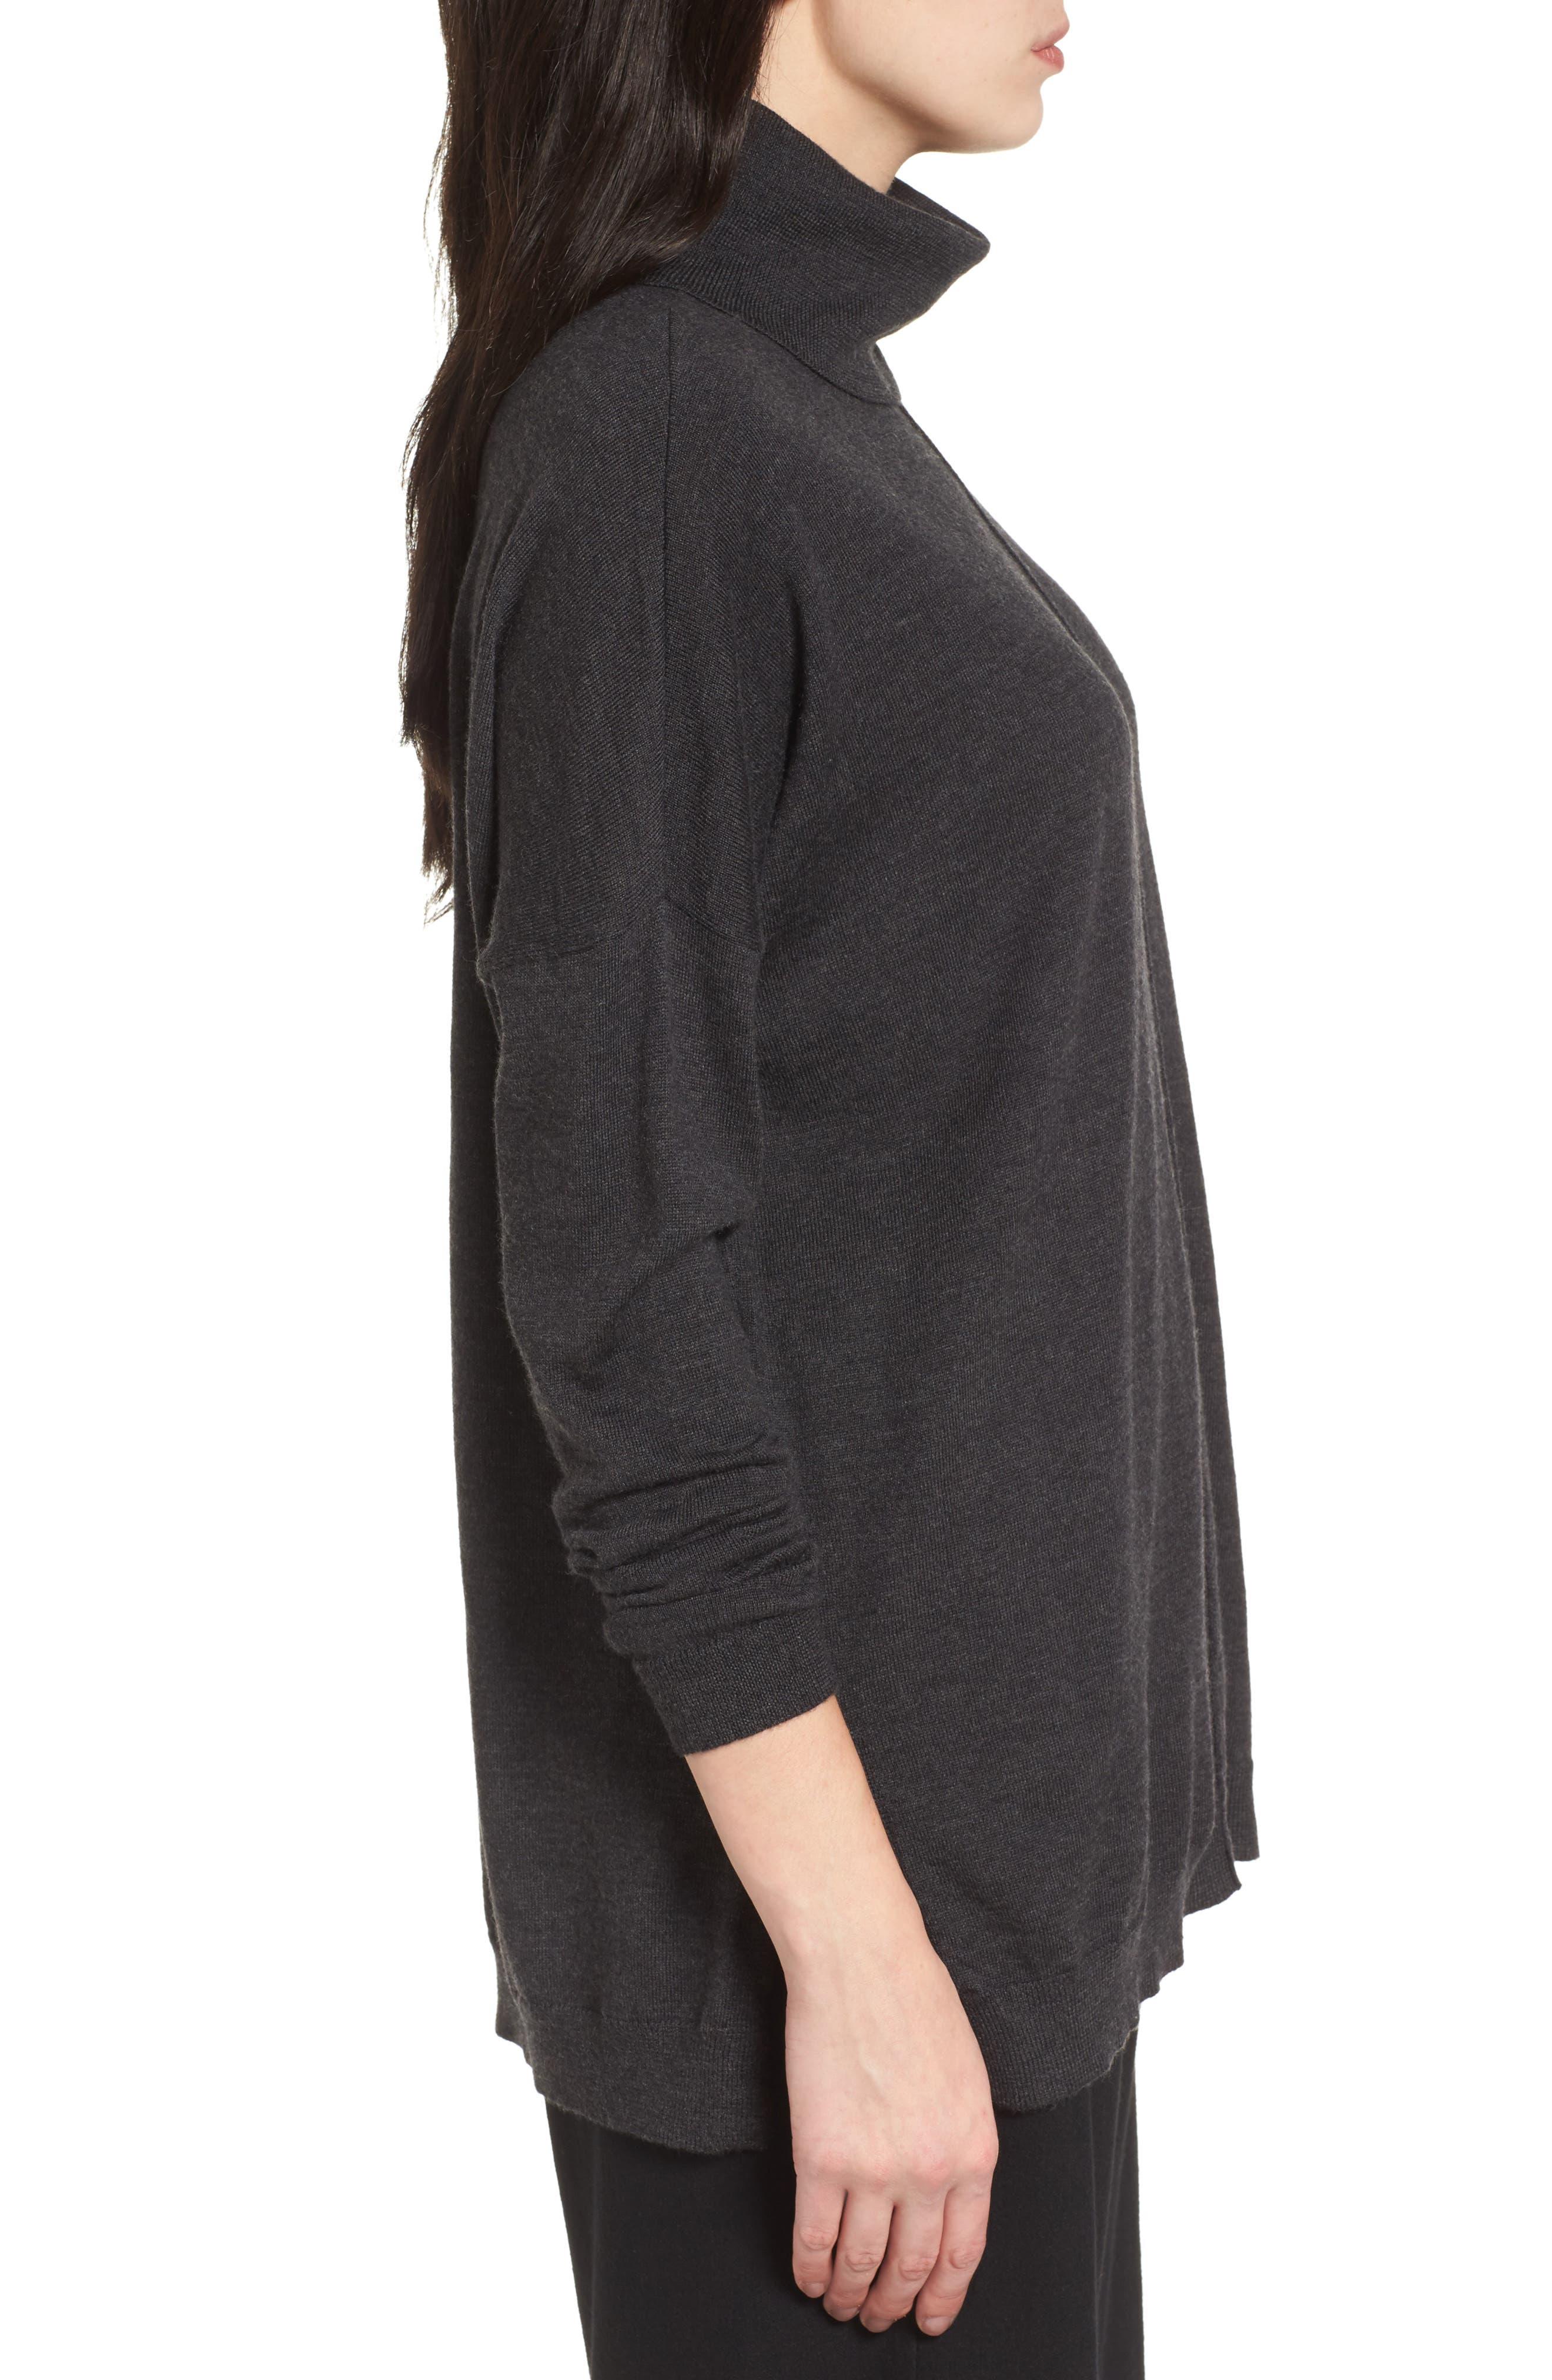 Merino Wool Boxy Turtleneck Sweater,                             Alternate thumbnail 3, color,                             021